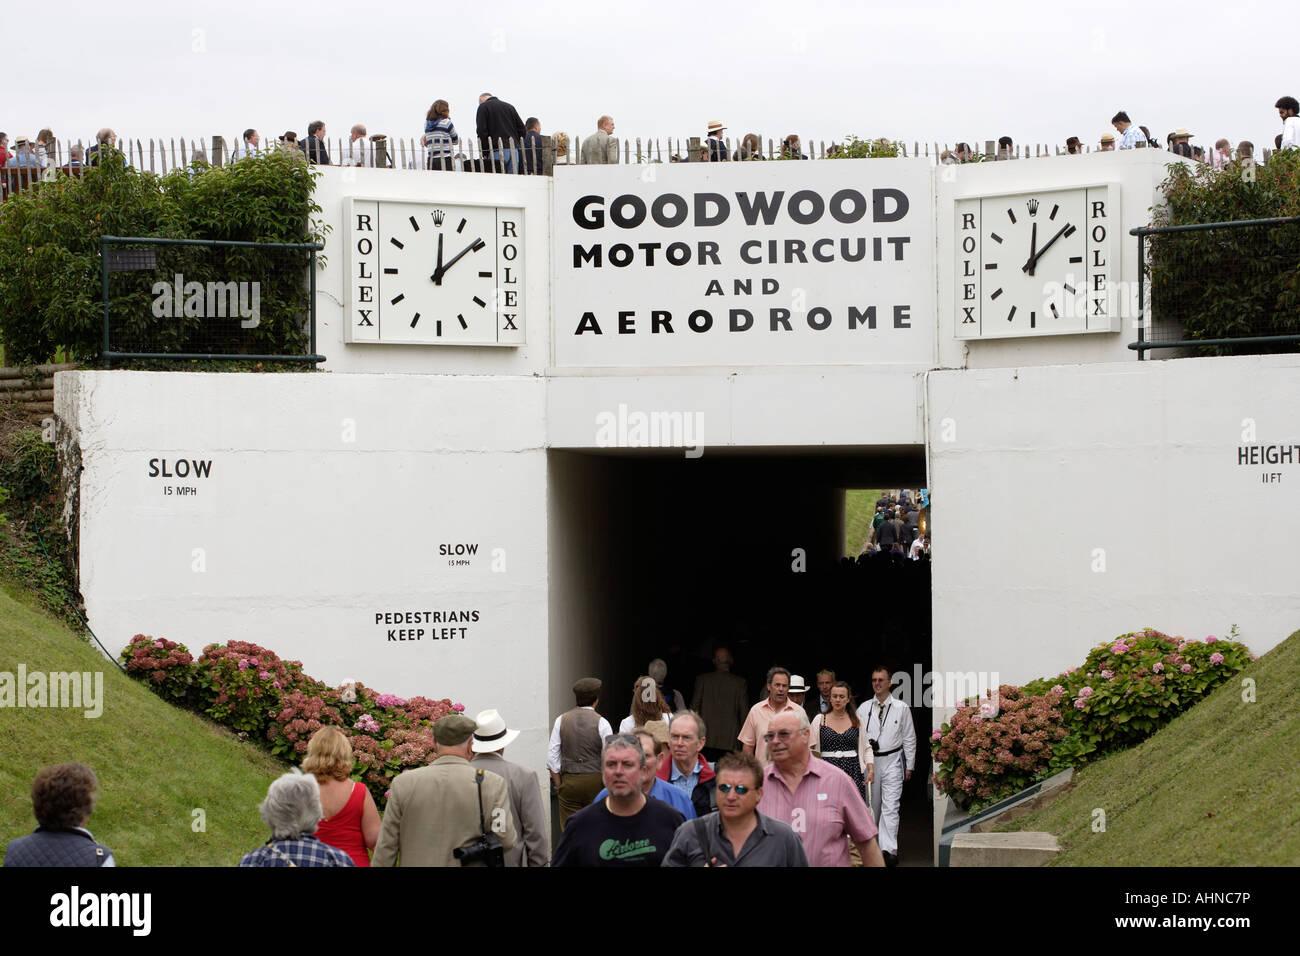 Goodwood motor circuit and aerodrome Chichester England UK - Stock Image